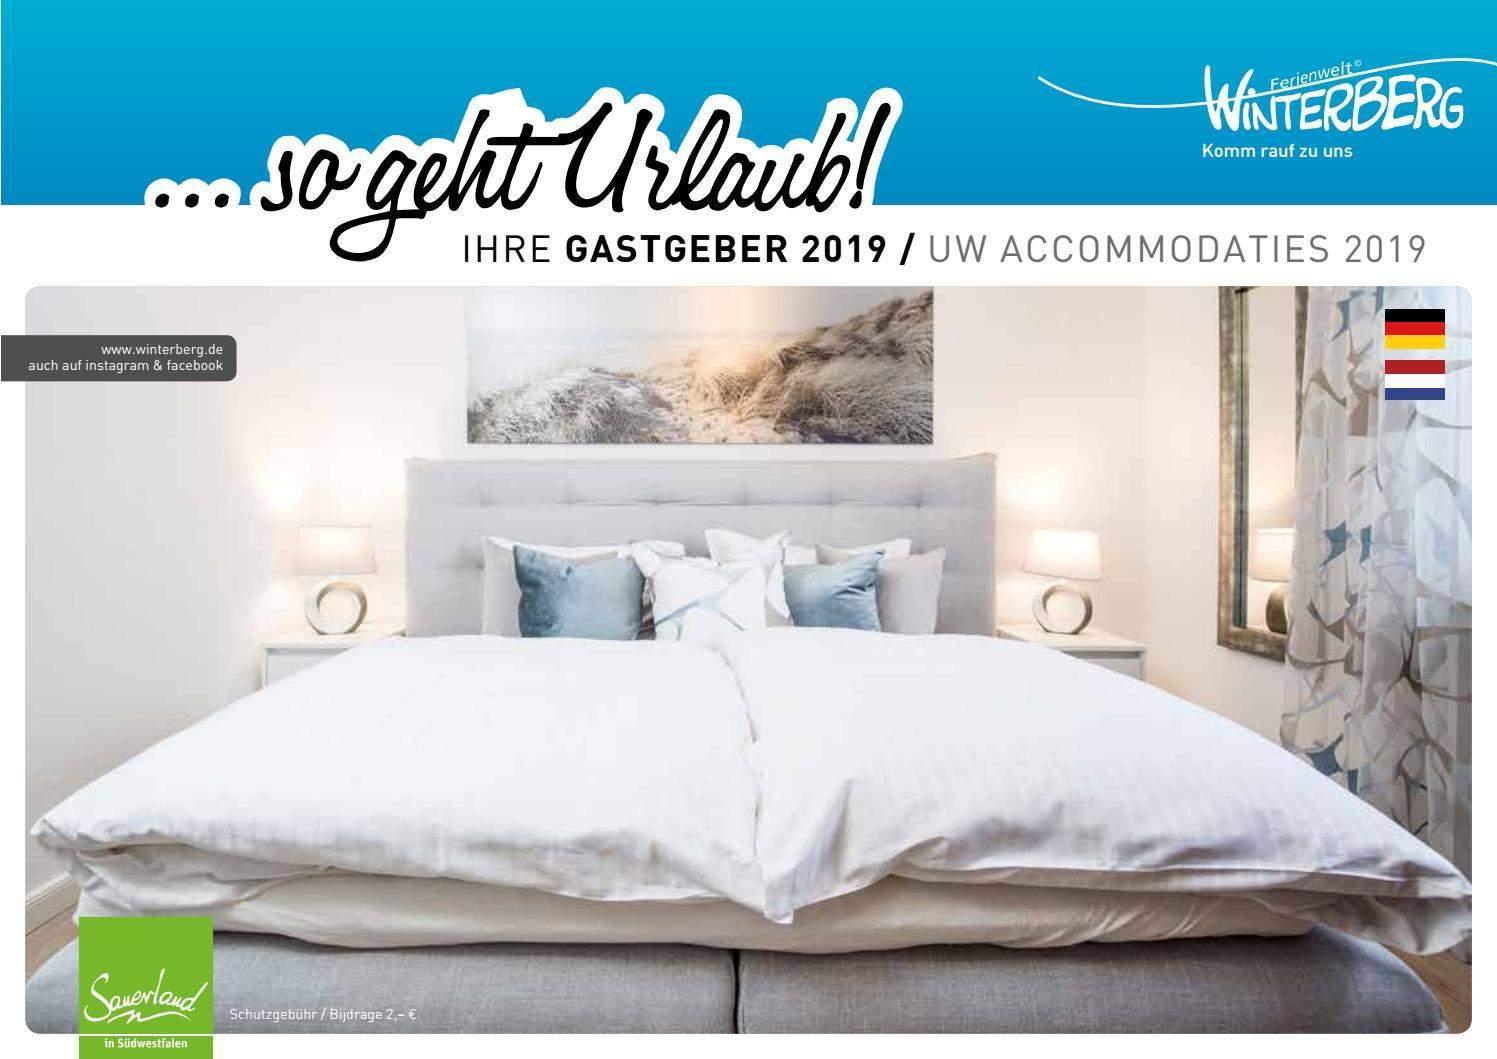 led beleuchtung garten einzigartig gastgeber 2019 by ferienwelt winterberg issuu of led beleuchtung garten